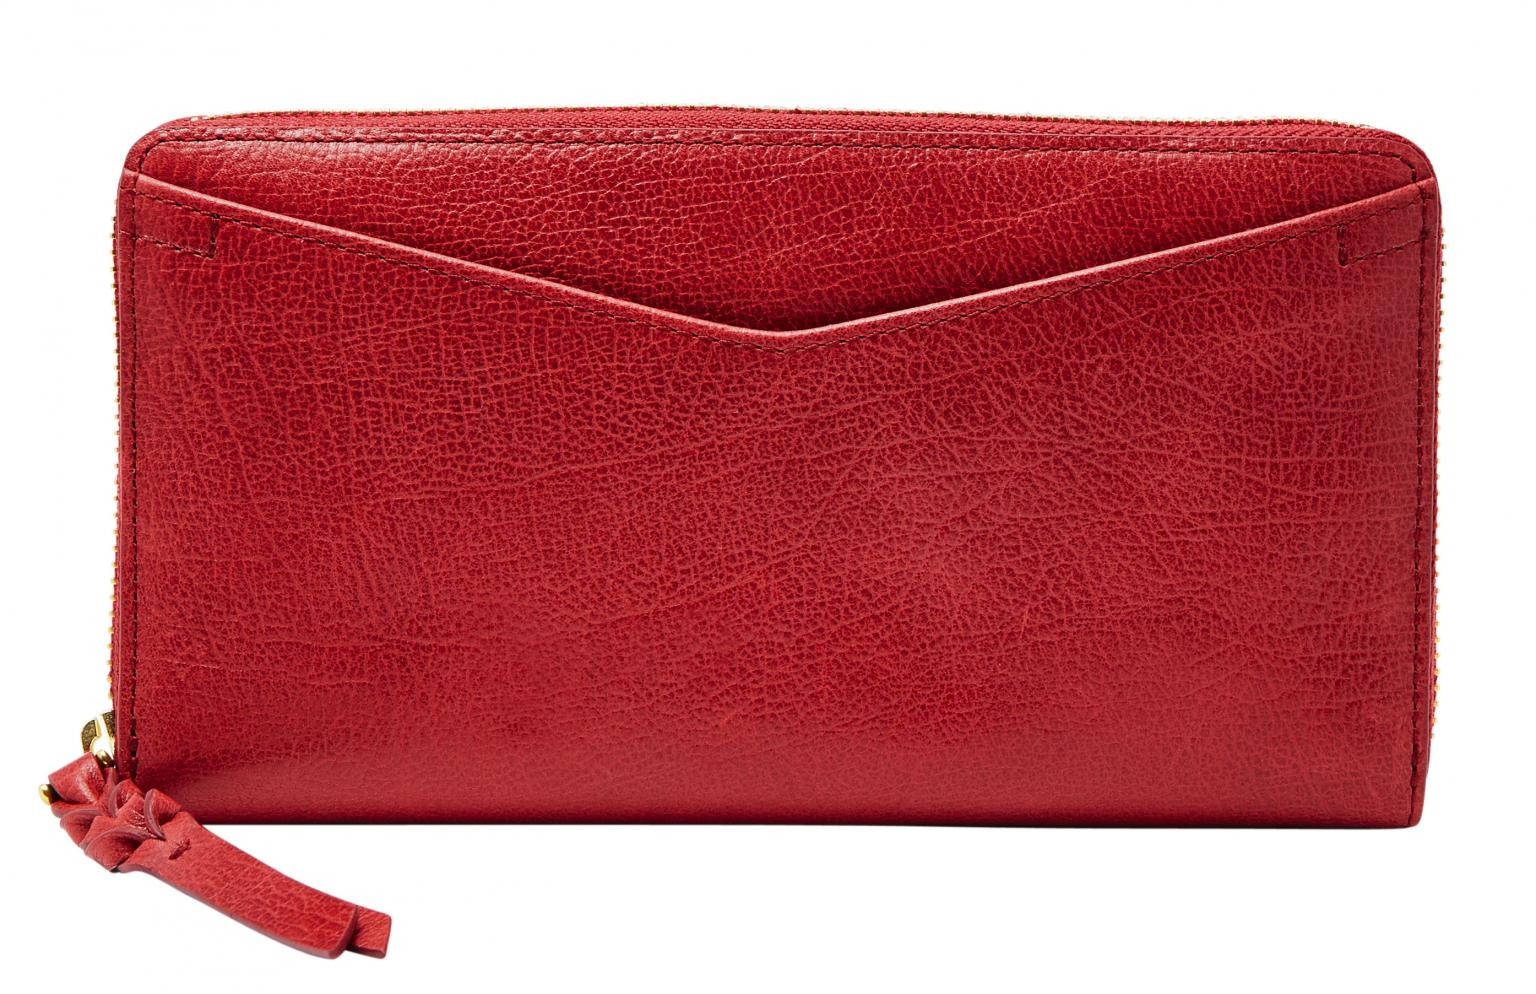 Fossil Longbörse Caroline Zip RFID Red Velvet Rot